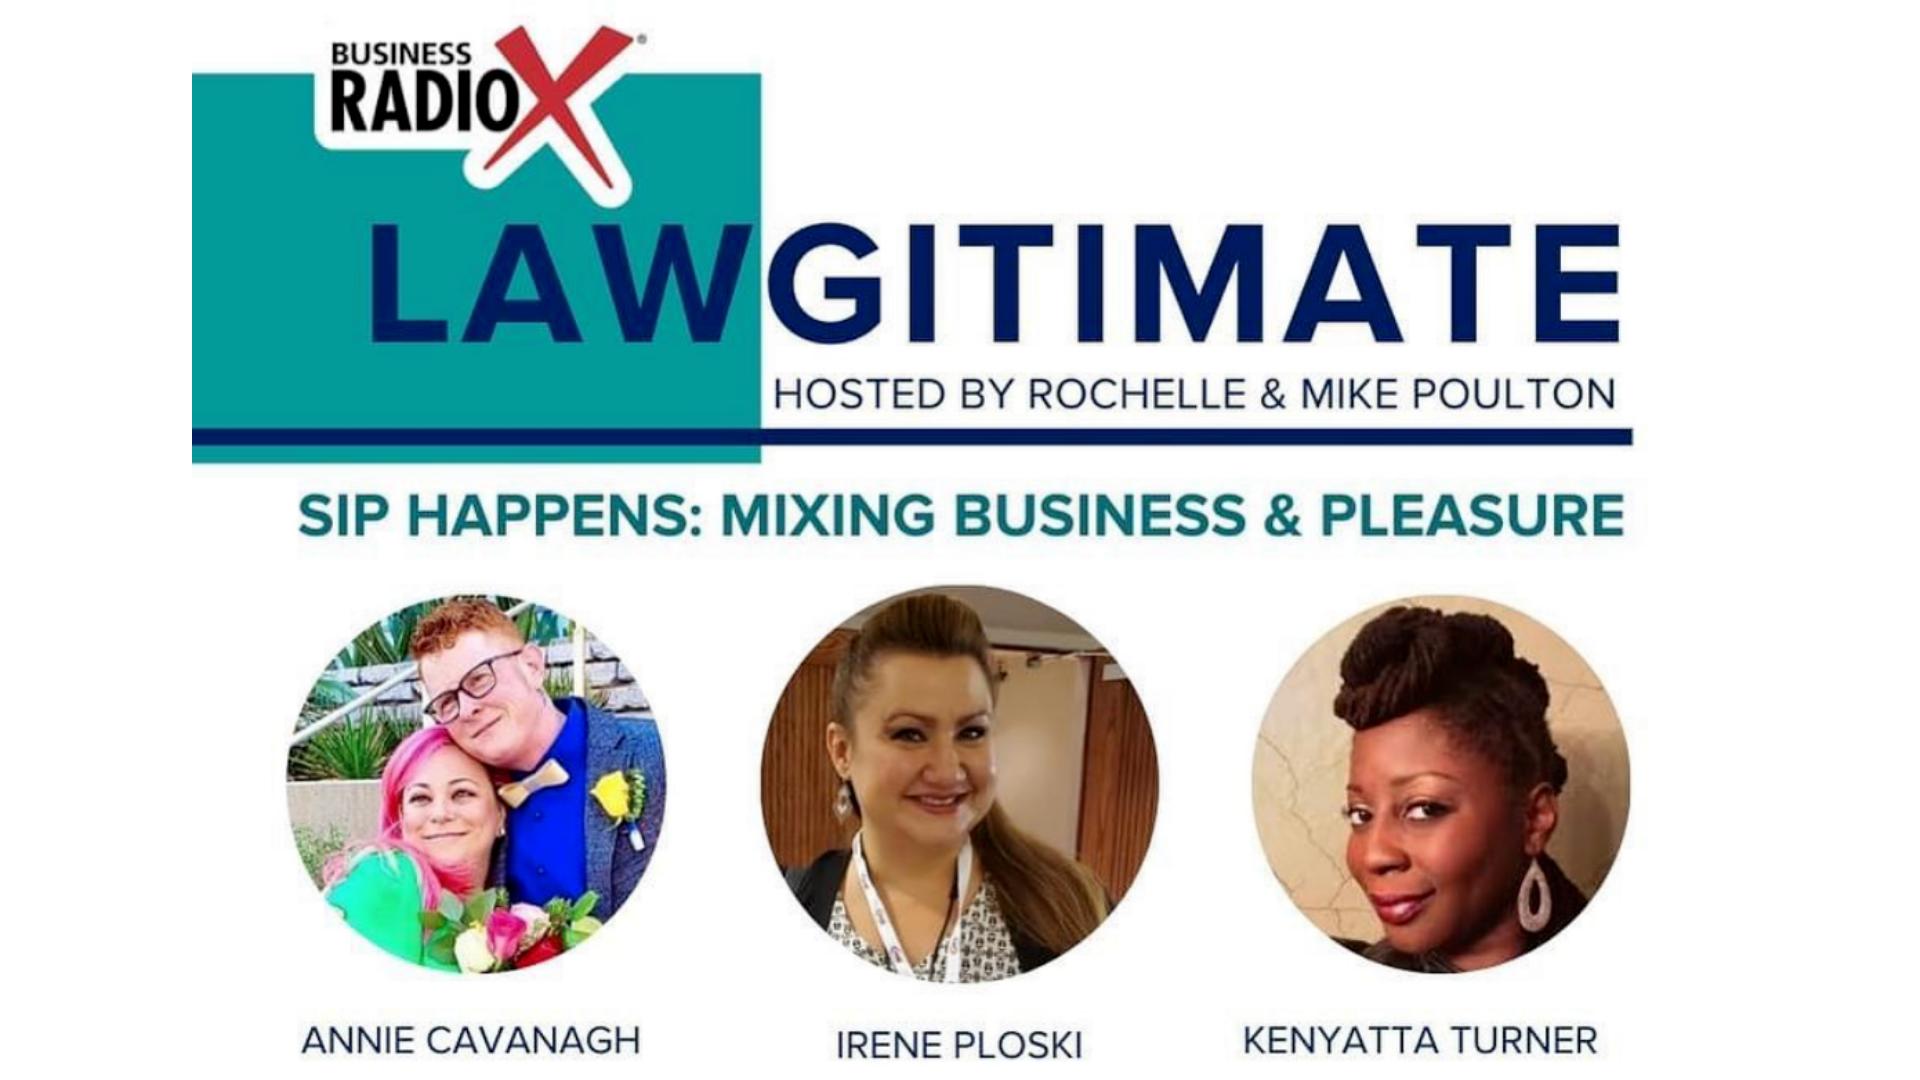 lawgitimate podcast radio show business radio x